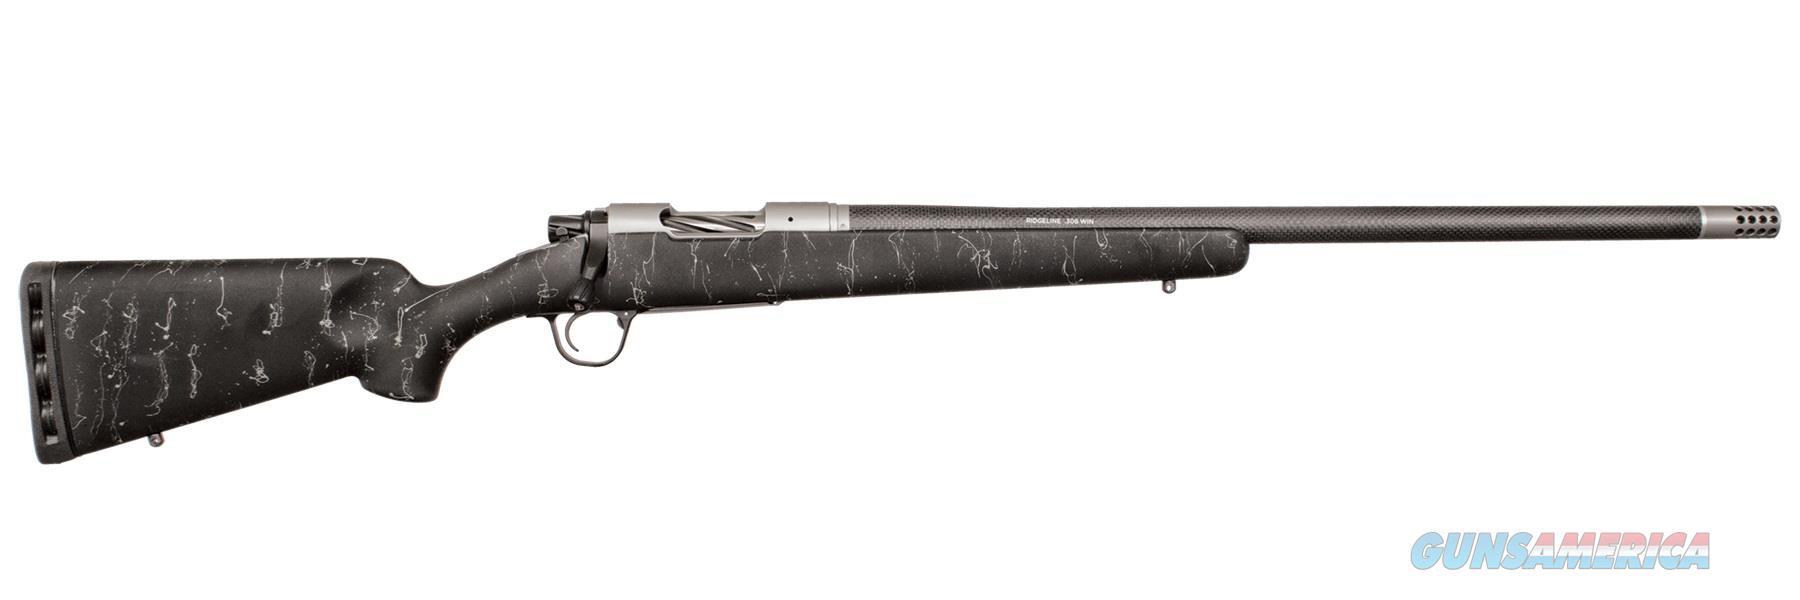 Christensen Arms RIDGELINE 308WIN BLK/GRY 24 CA10299-414411  Guns > Rifles > C Misc Rifles